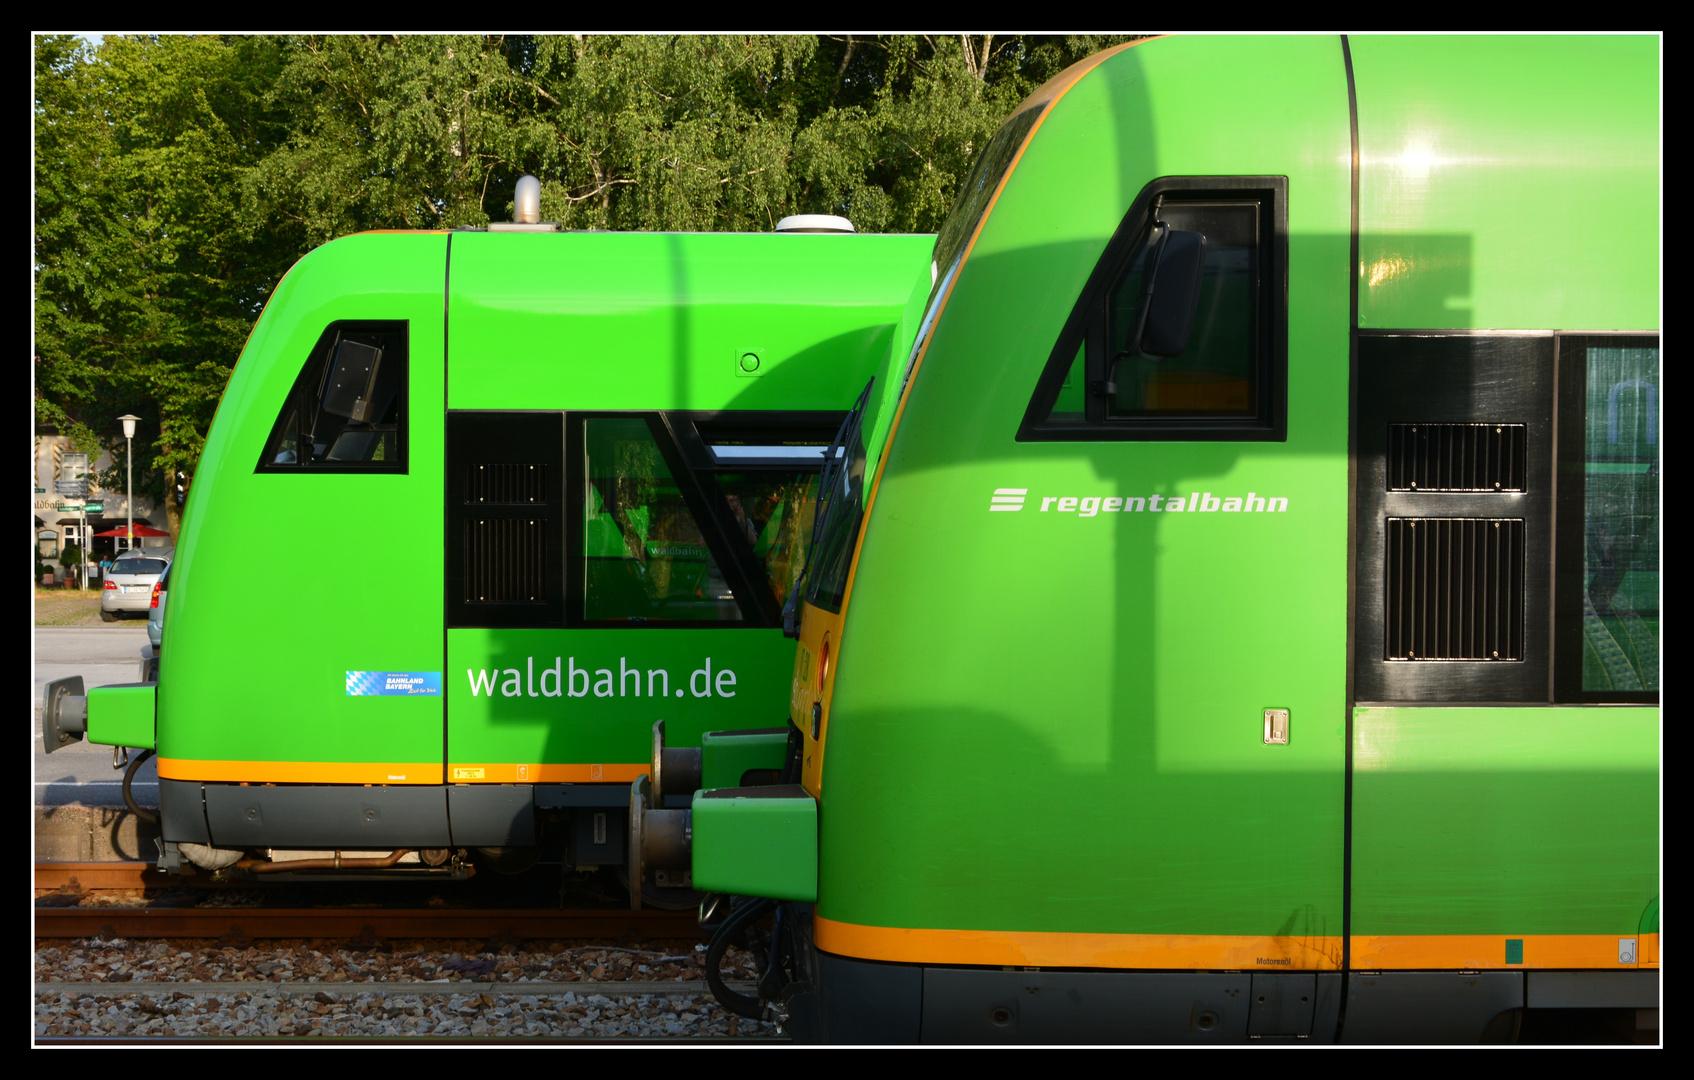 Waldbahn trifft Regentalbahn